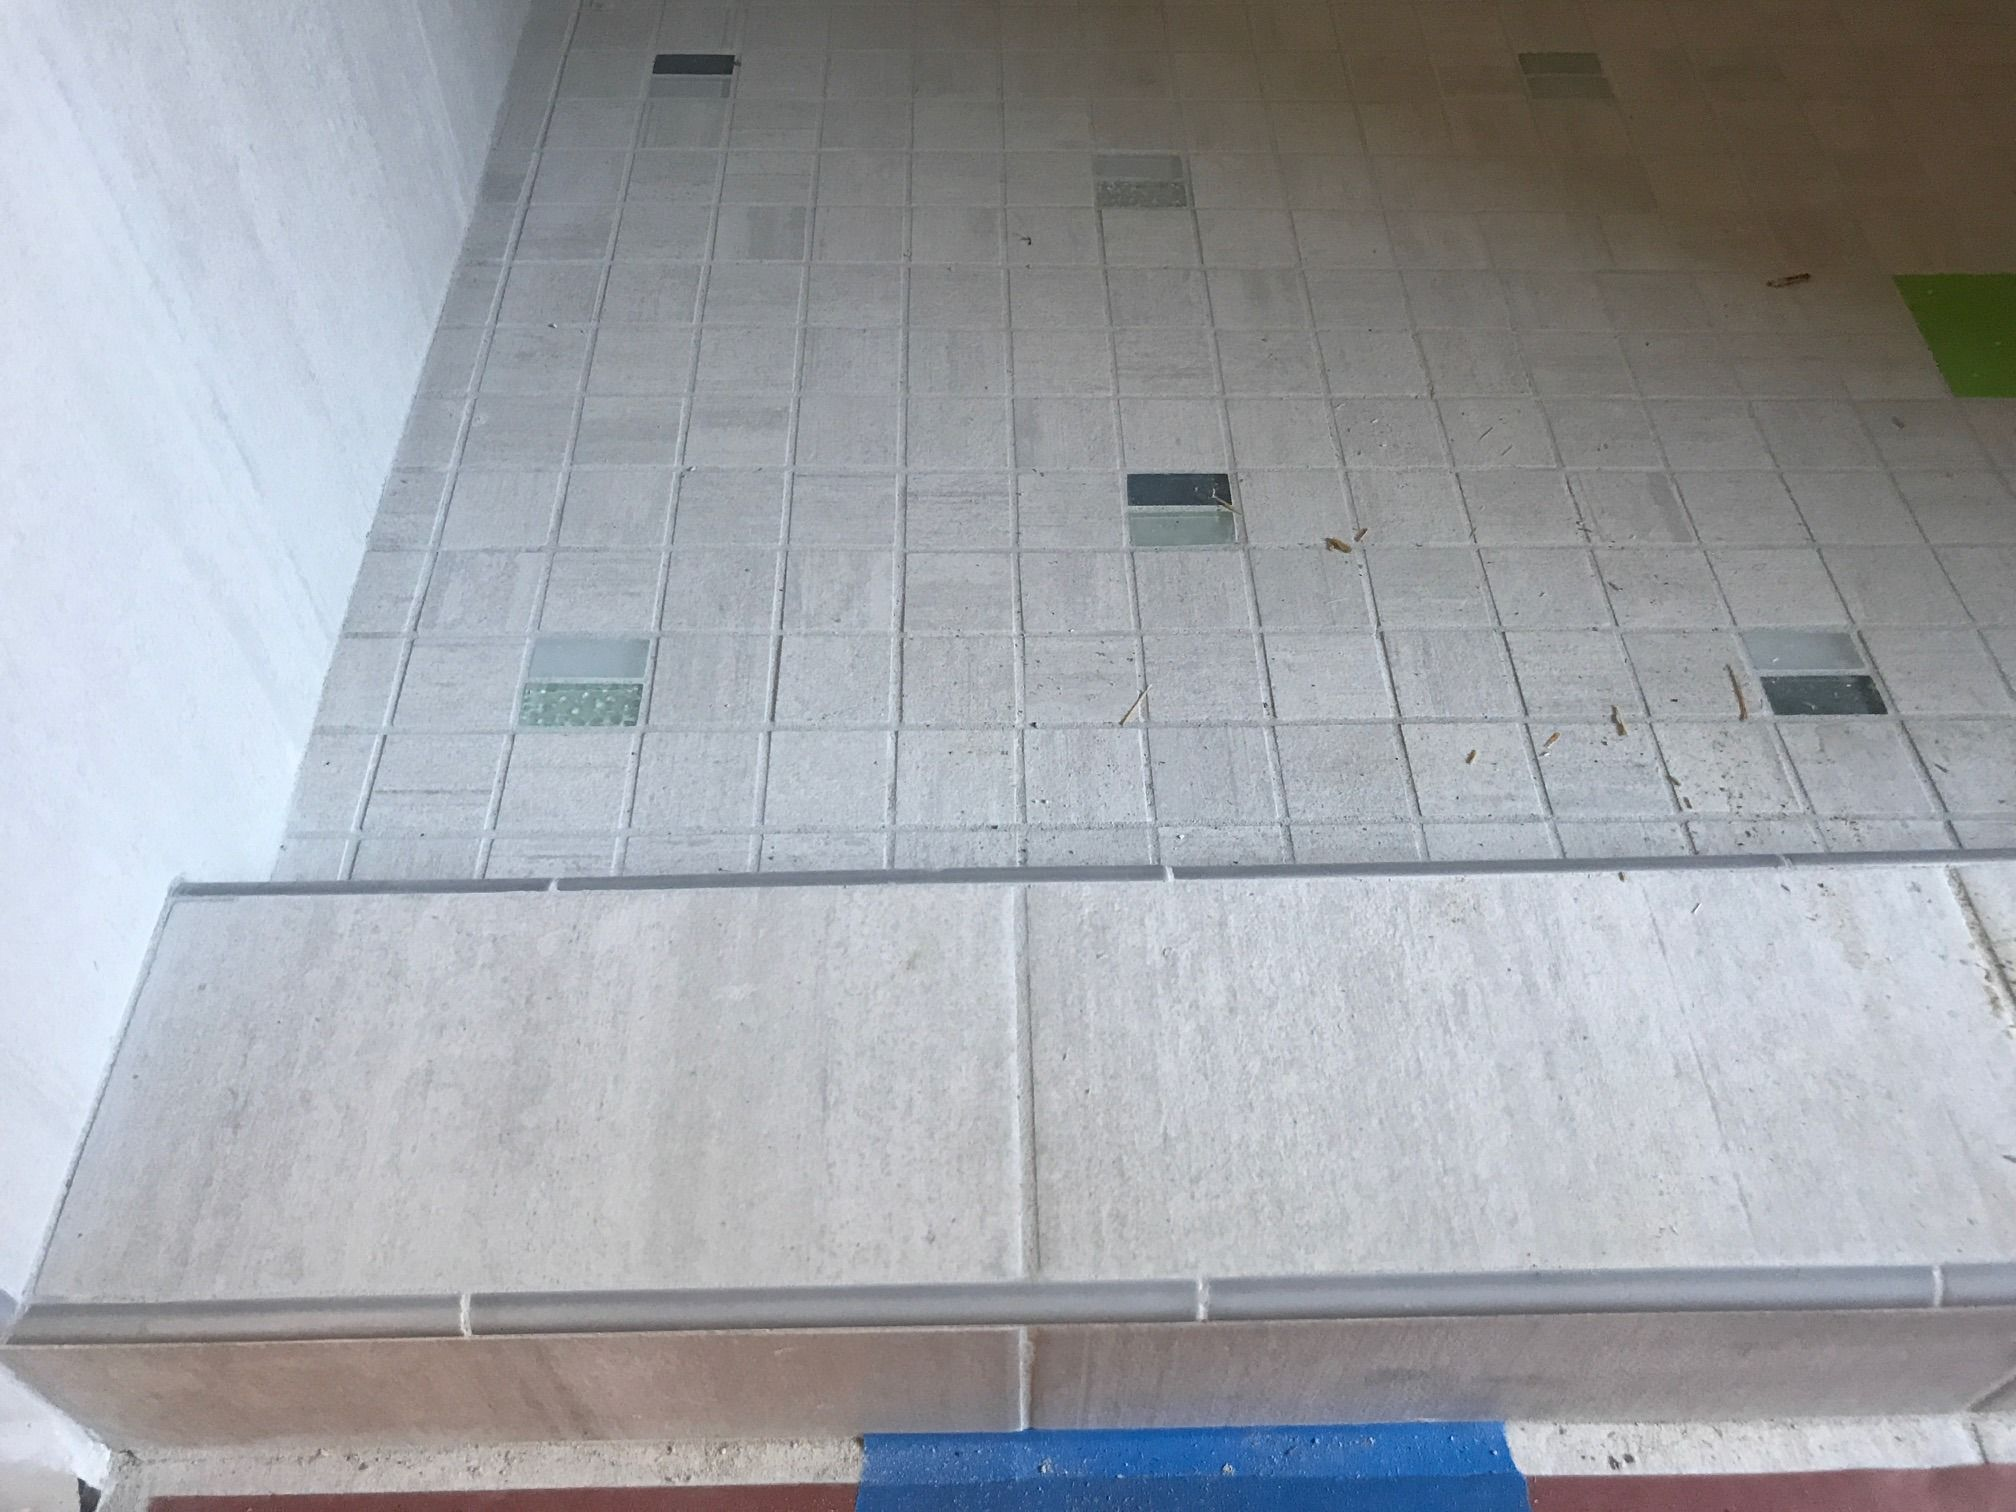 Pin by Arizona Tile on Remodeling Tips | Pinterest | Porcelain tile ...